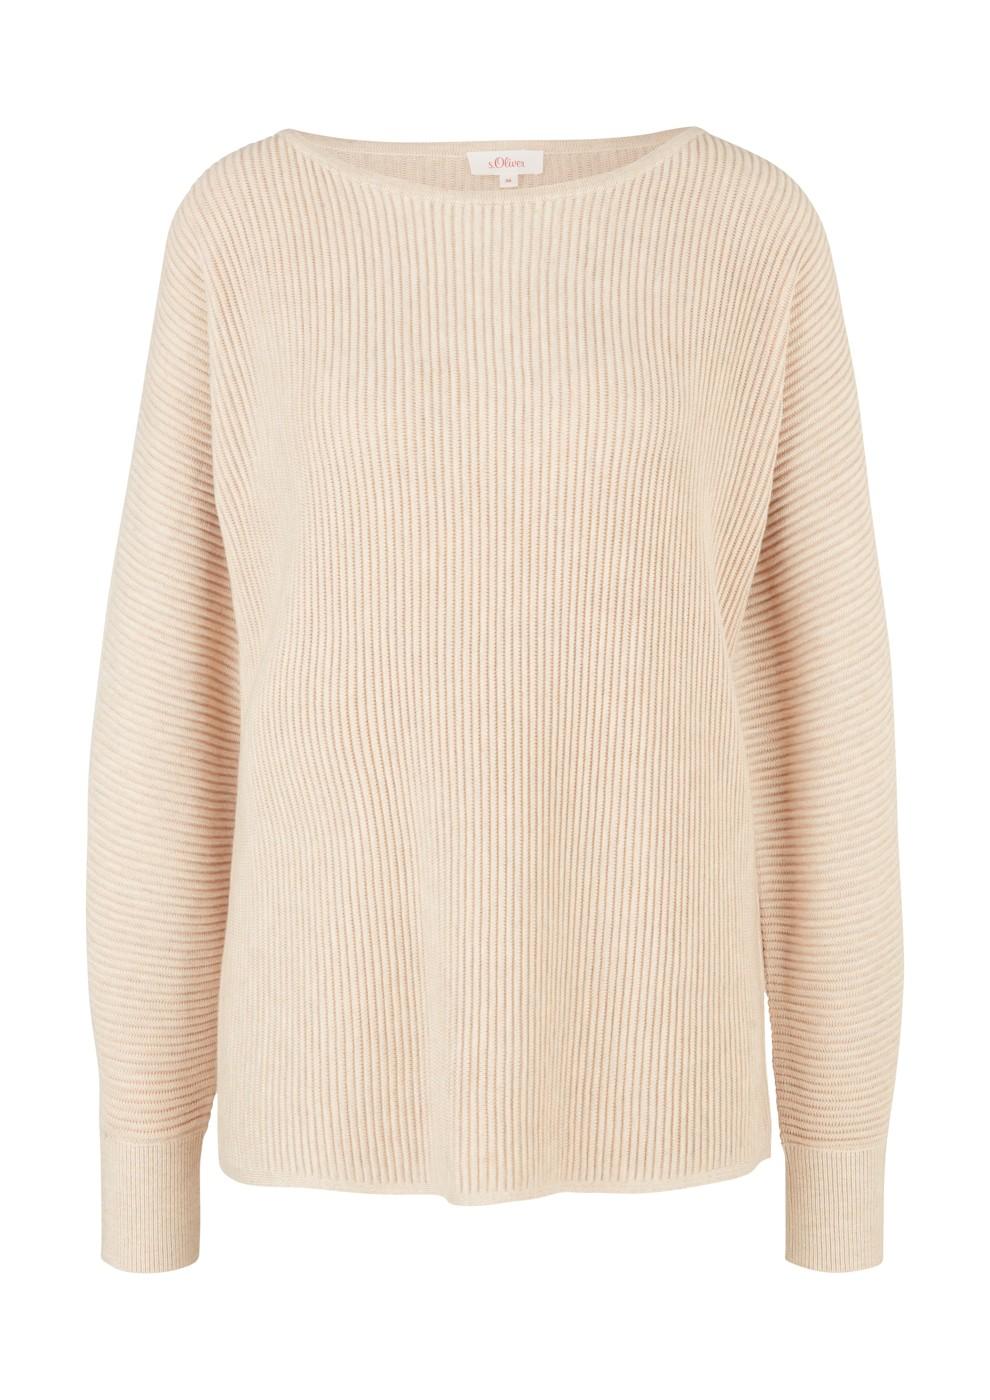 120 Pullover langarm - Damen